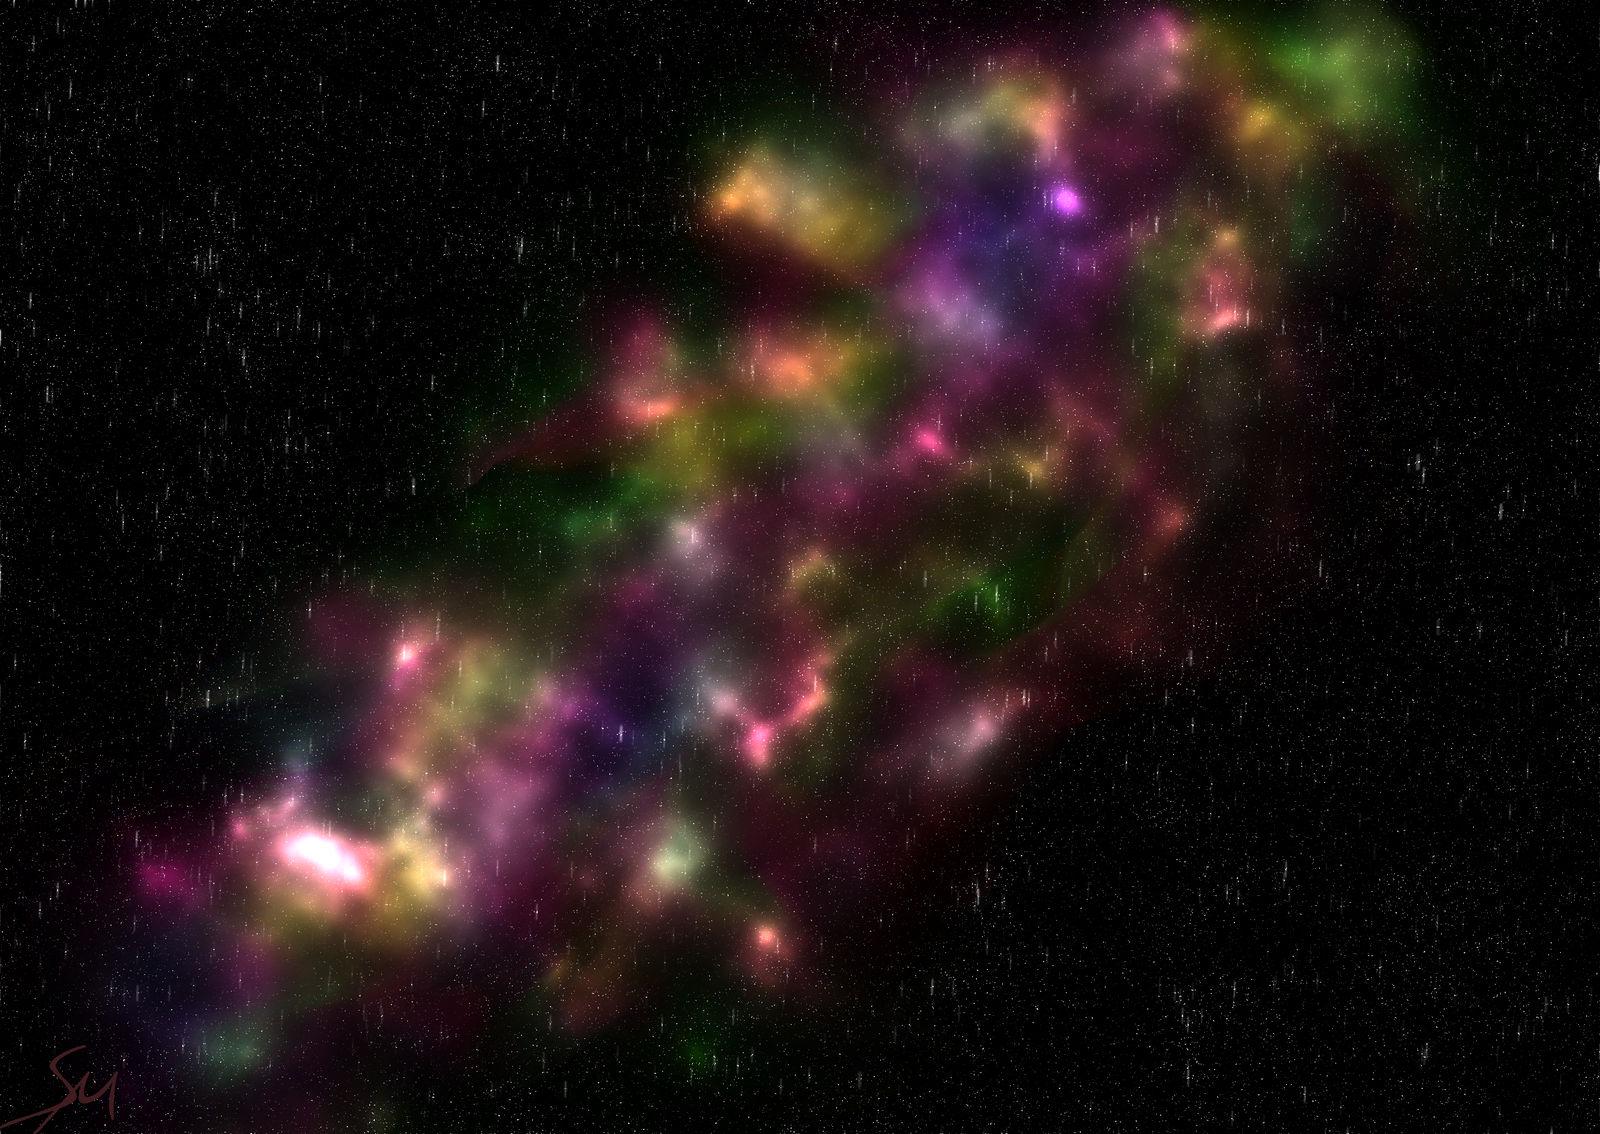 Tendril Nebula